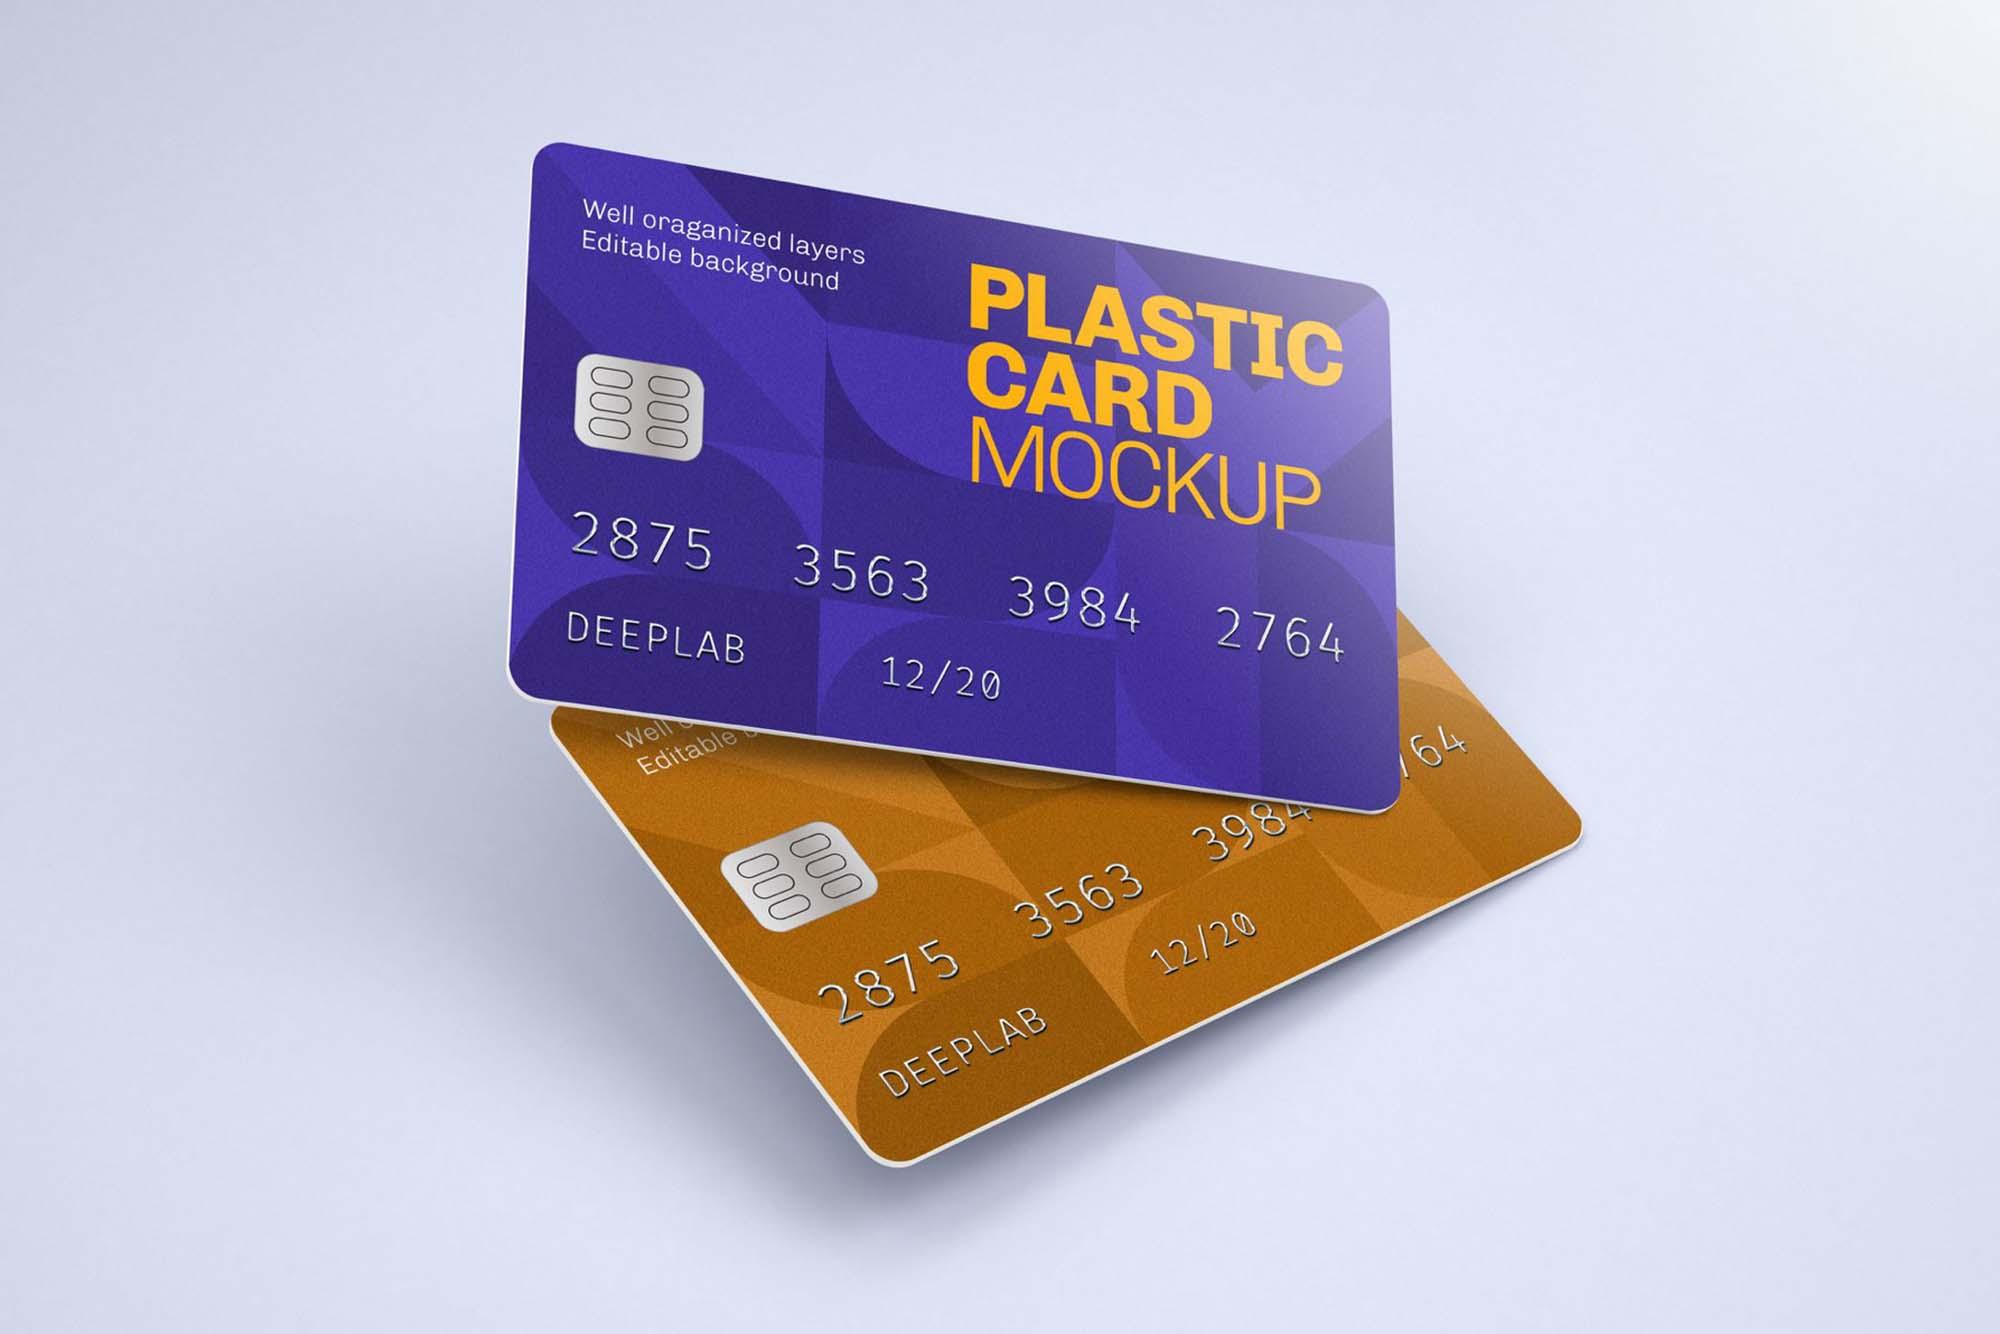 Plastic Credit Card Mockup